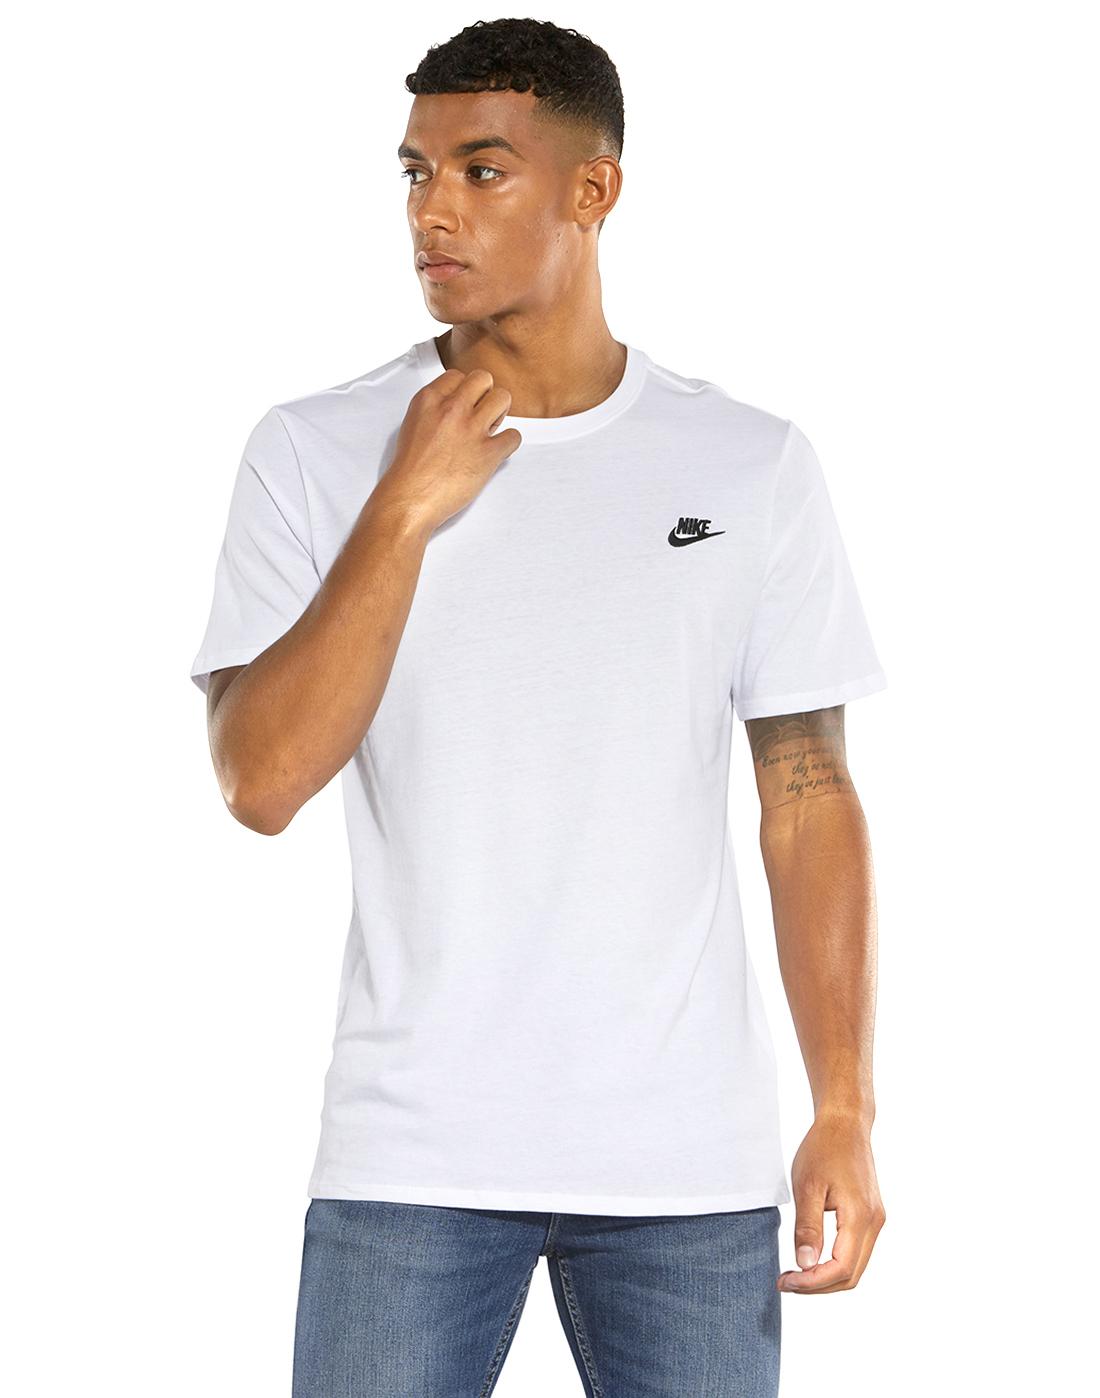 8159b170 Nike Mens Futura T-Shirt | Life Style Sports